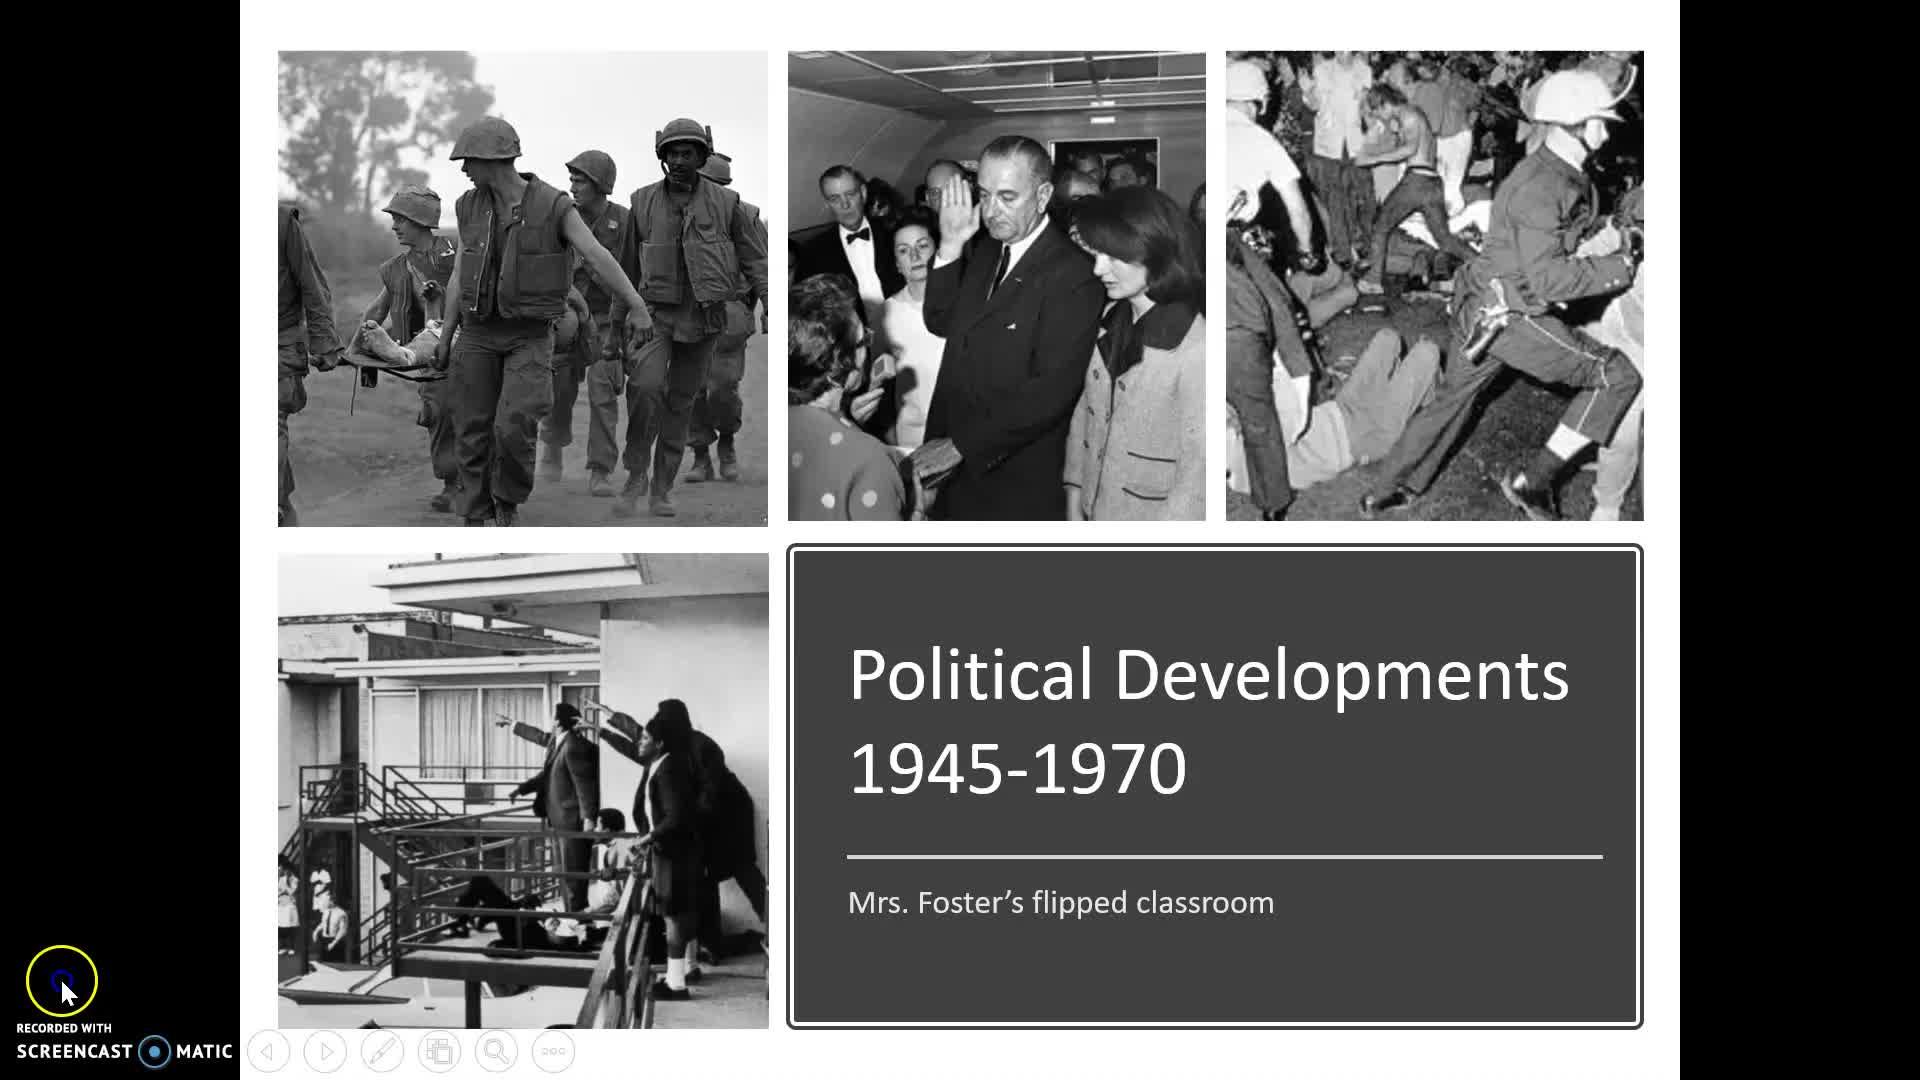 Political developments 1945-1970 flipped classroom